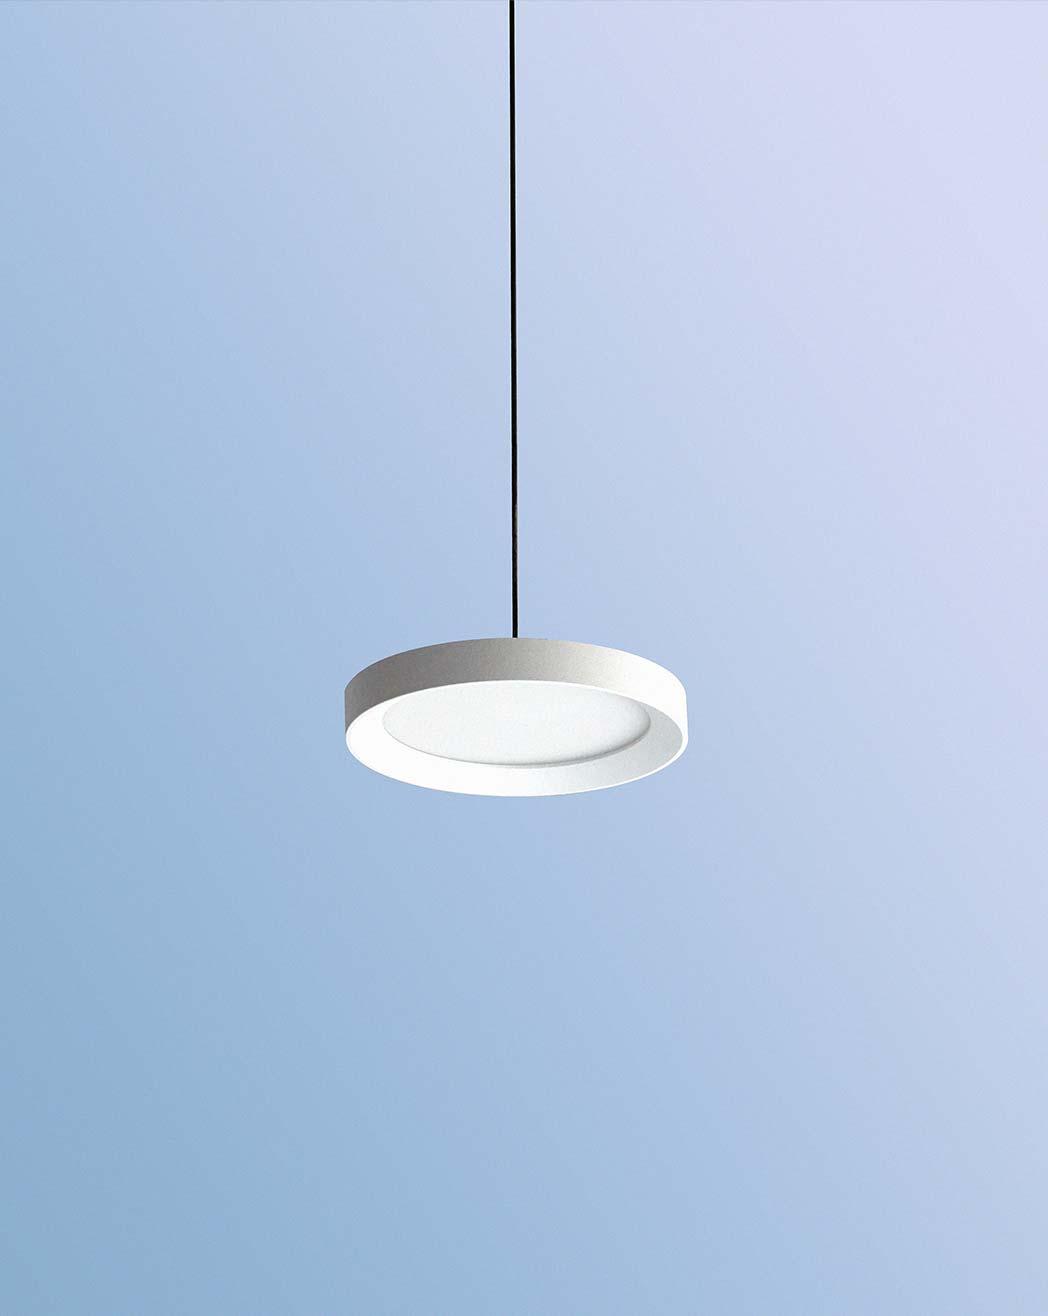 Minimal white light